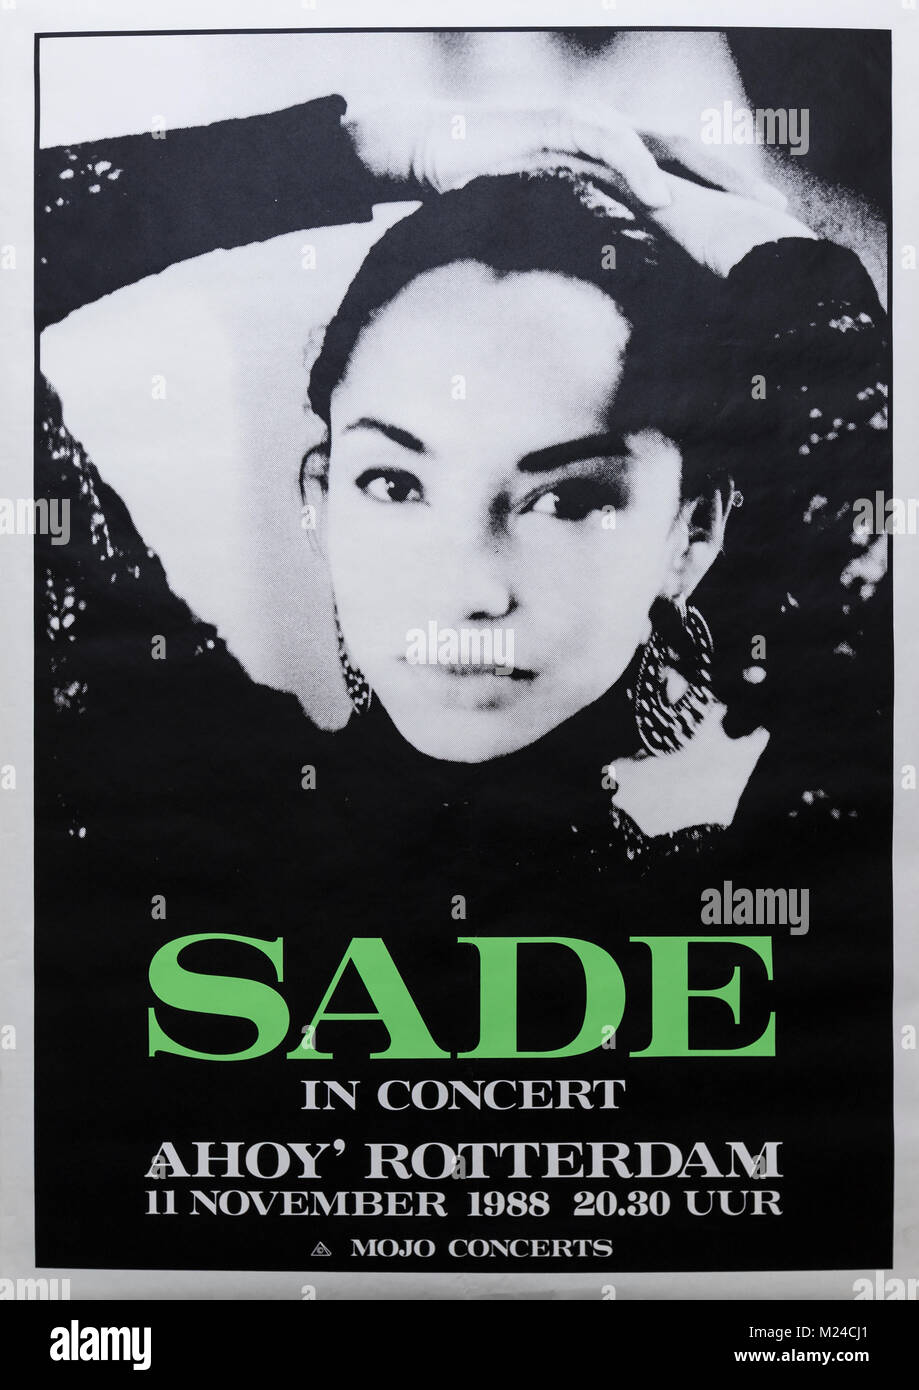 sade-in-concert-ahoy-rotterdam-1988-musi